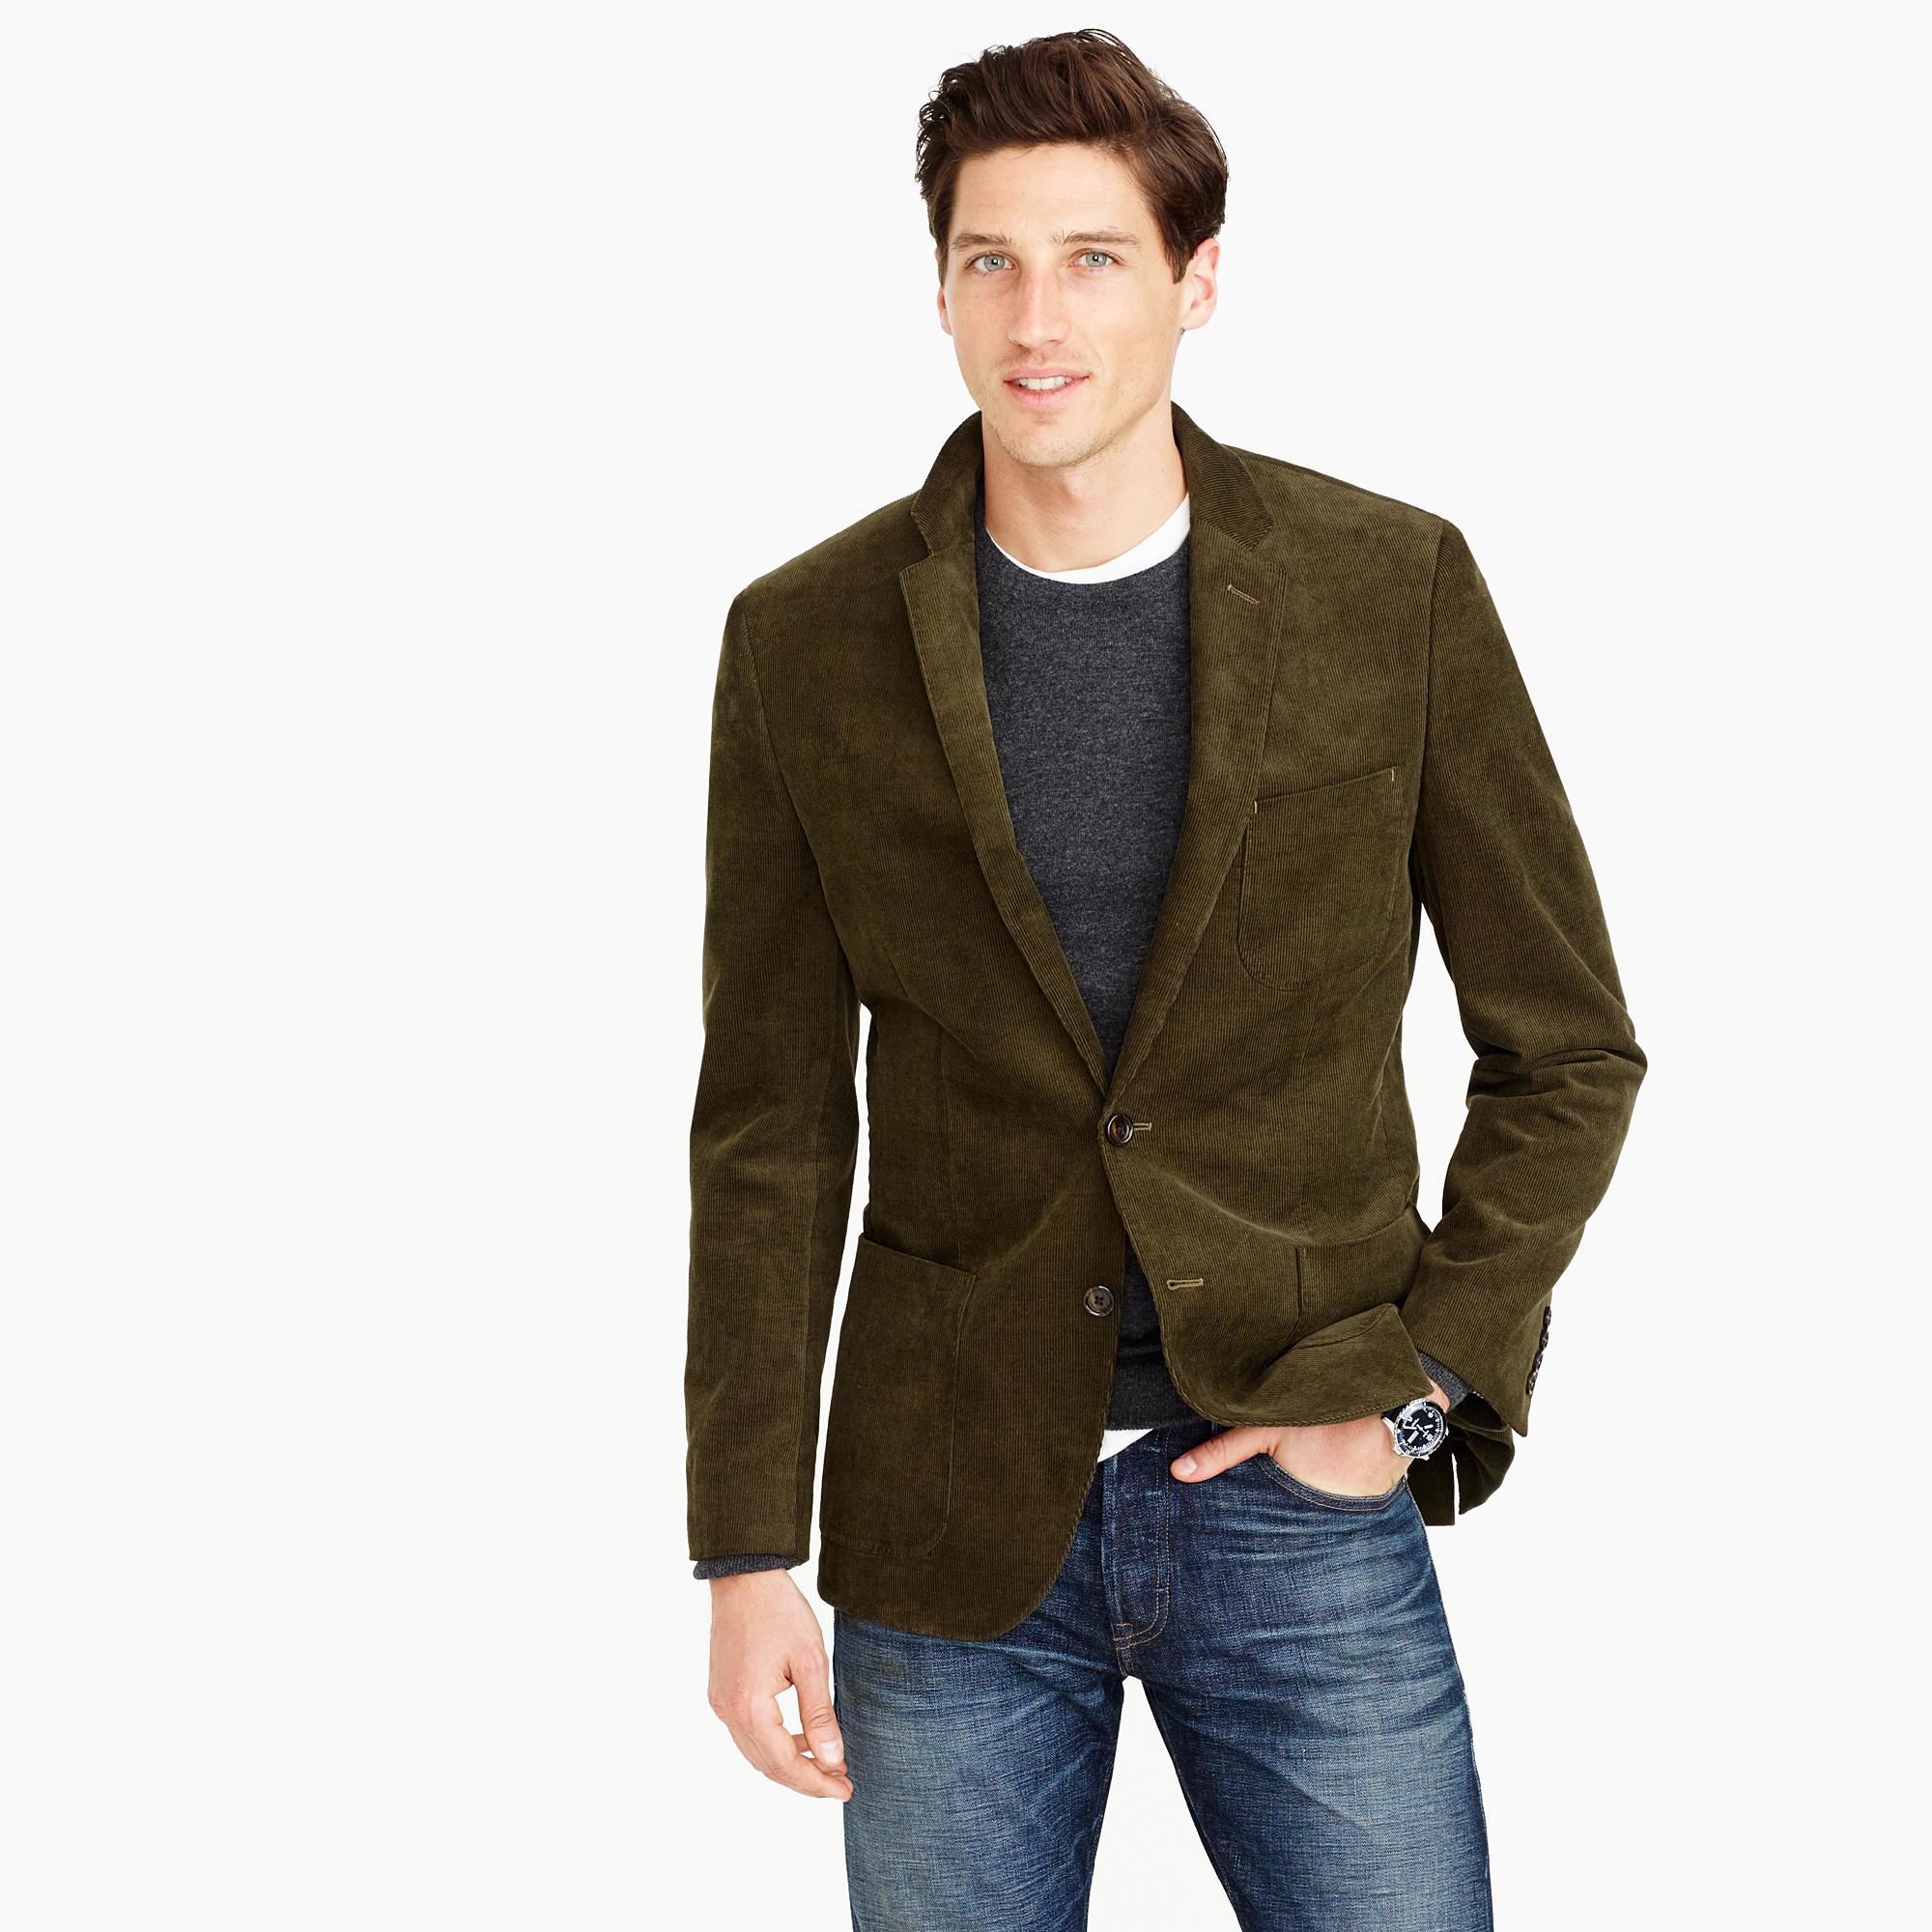 Blazers Jackets Mens: J.Crew Crosby Suit Jacket In Glen Plaid American